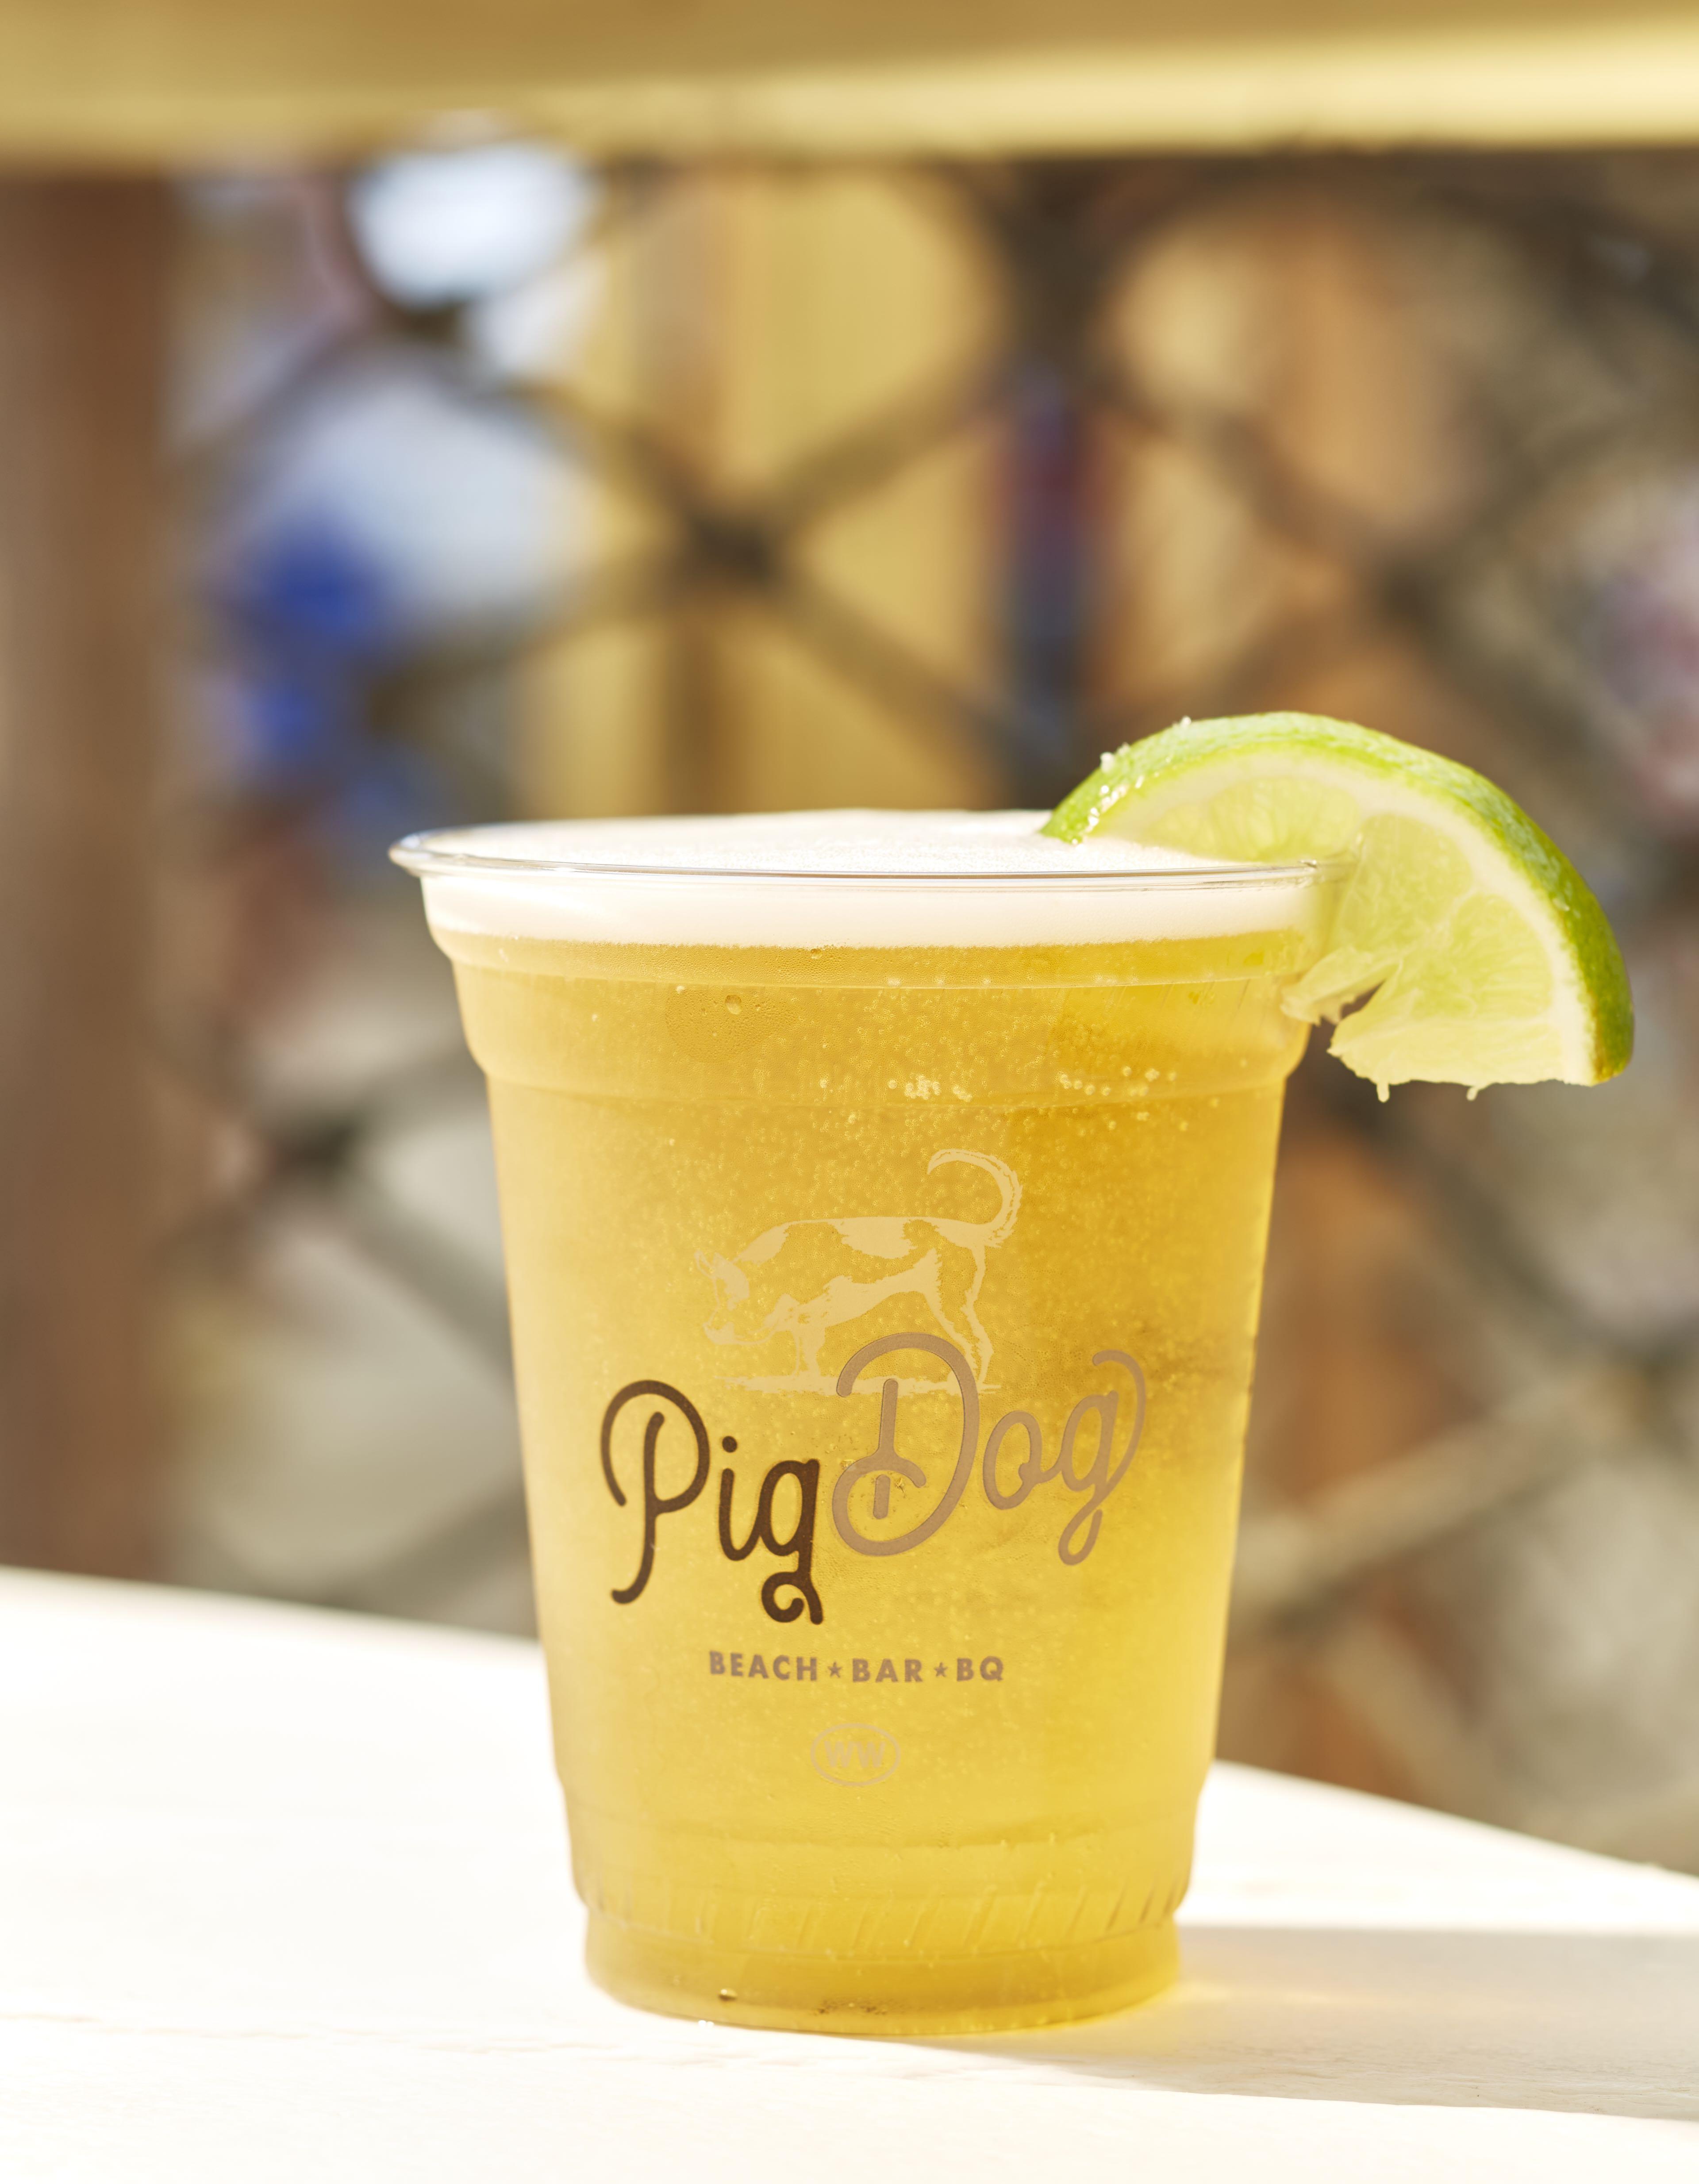 Pig Dog Drinks7